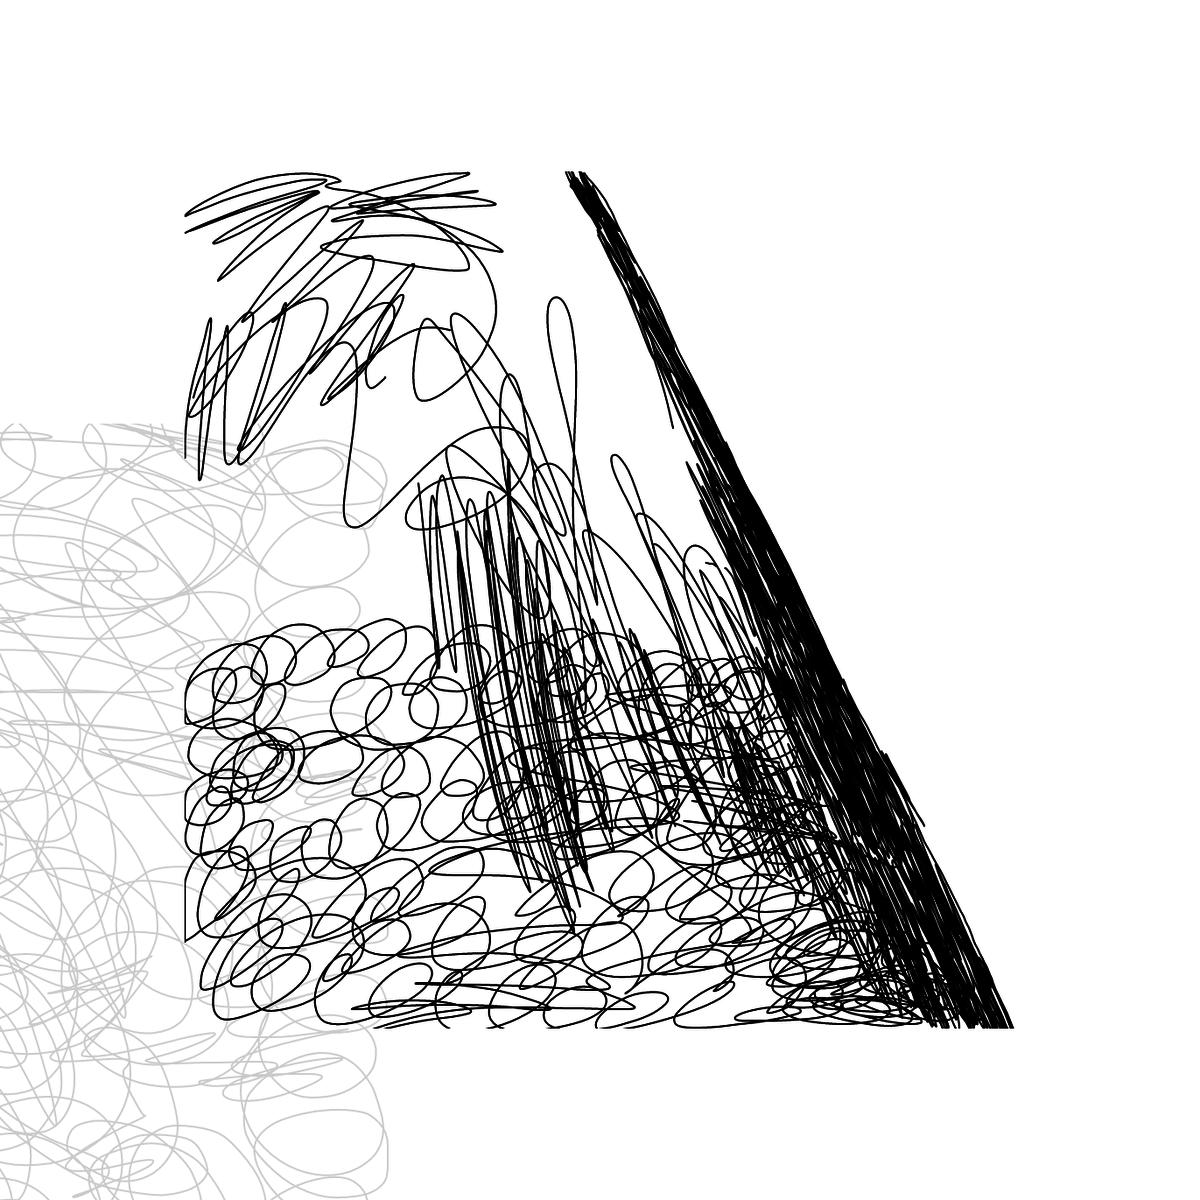 BAAAM drawing#6162 lat:52.4879722595214840lng: 13.4253606796264650